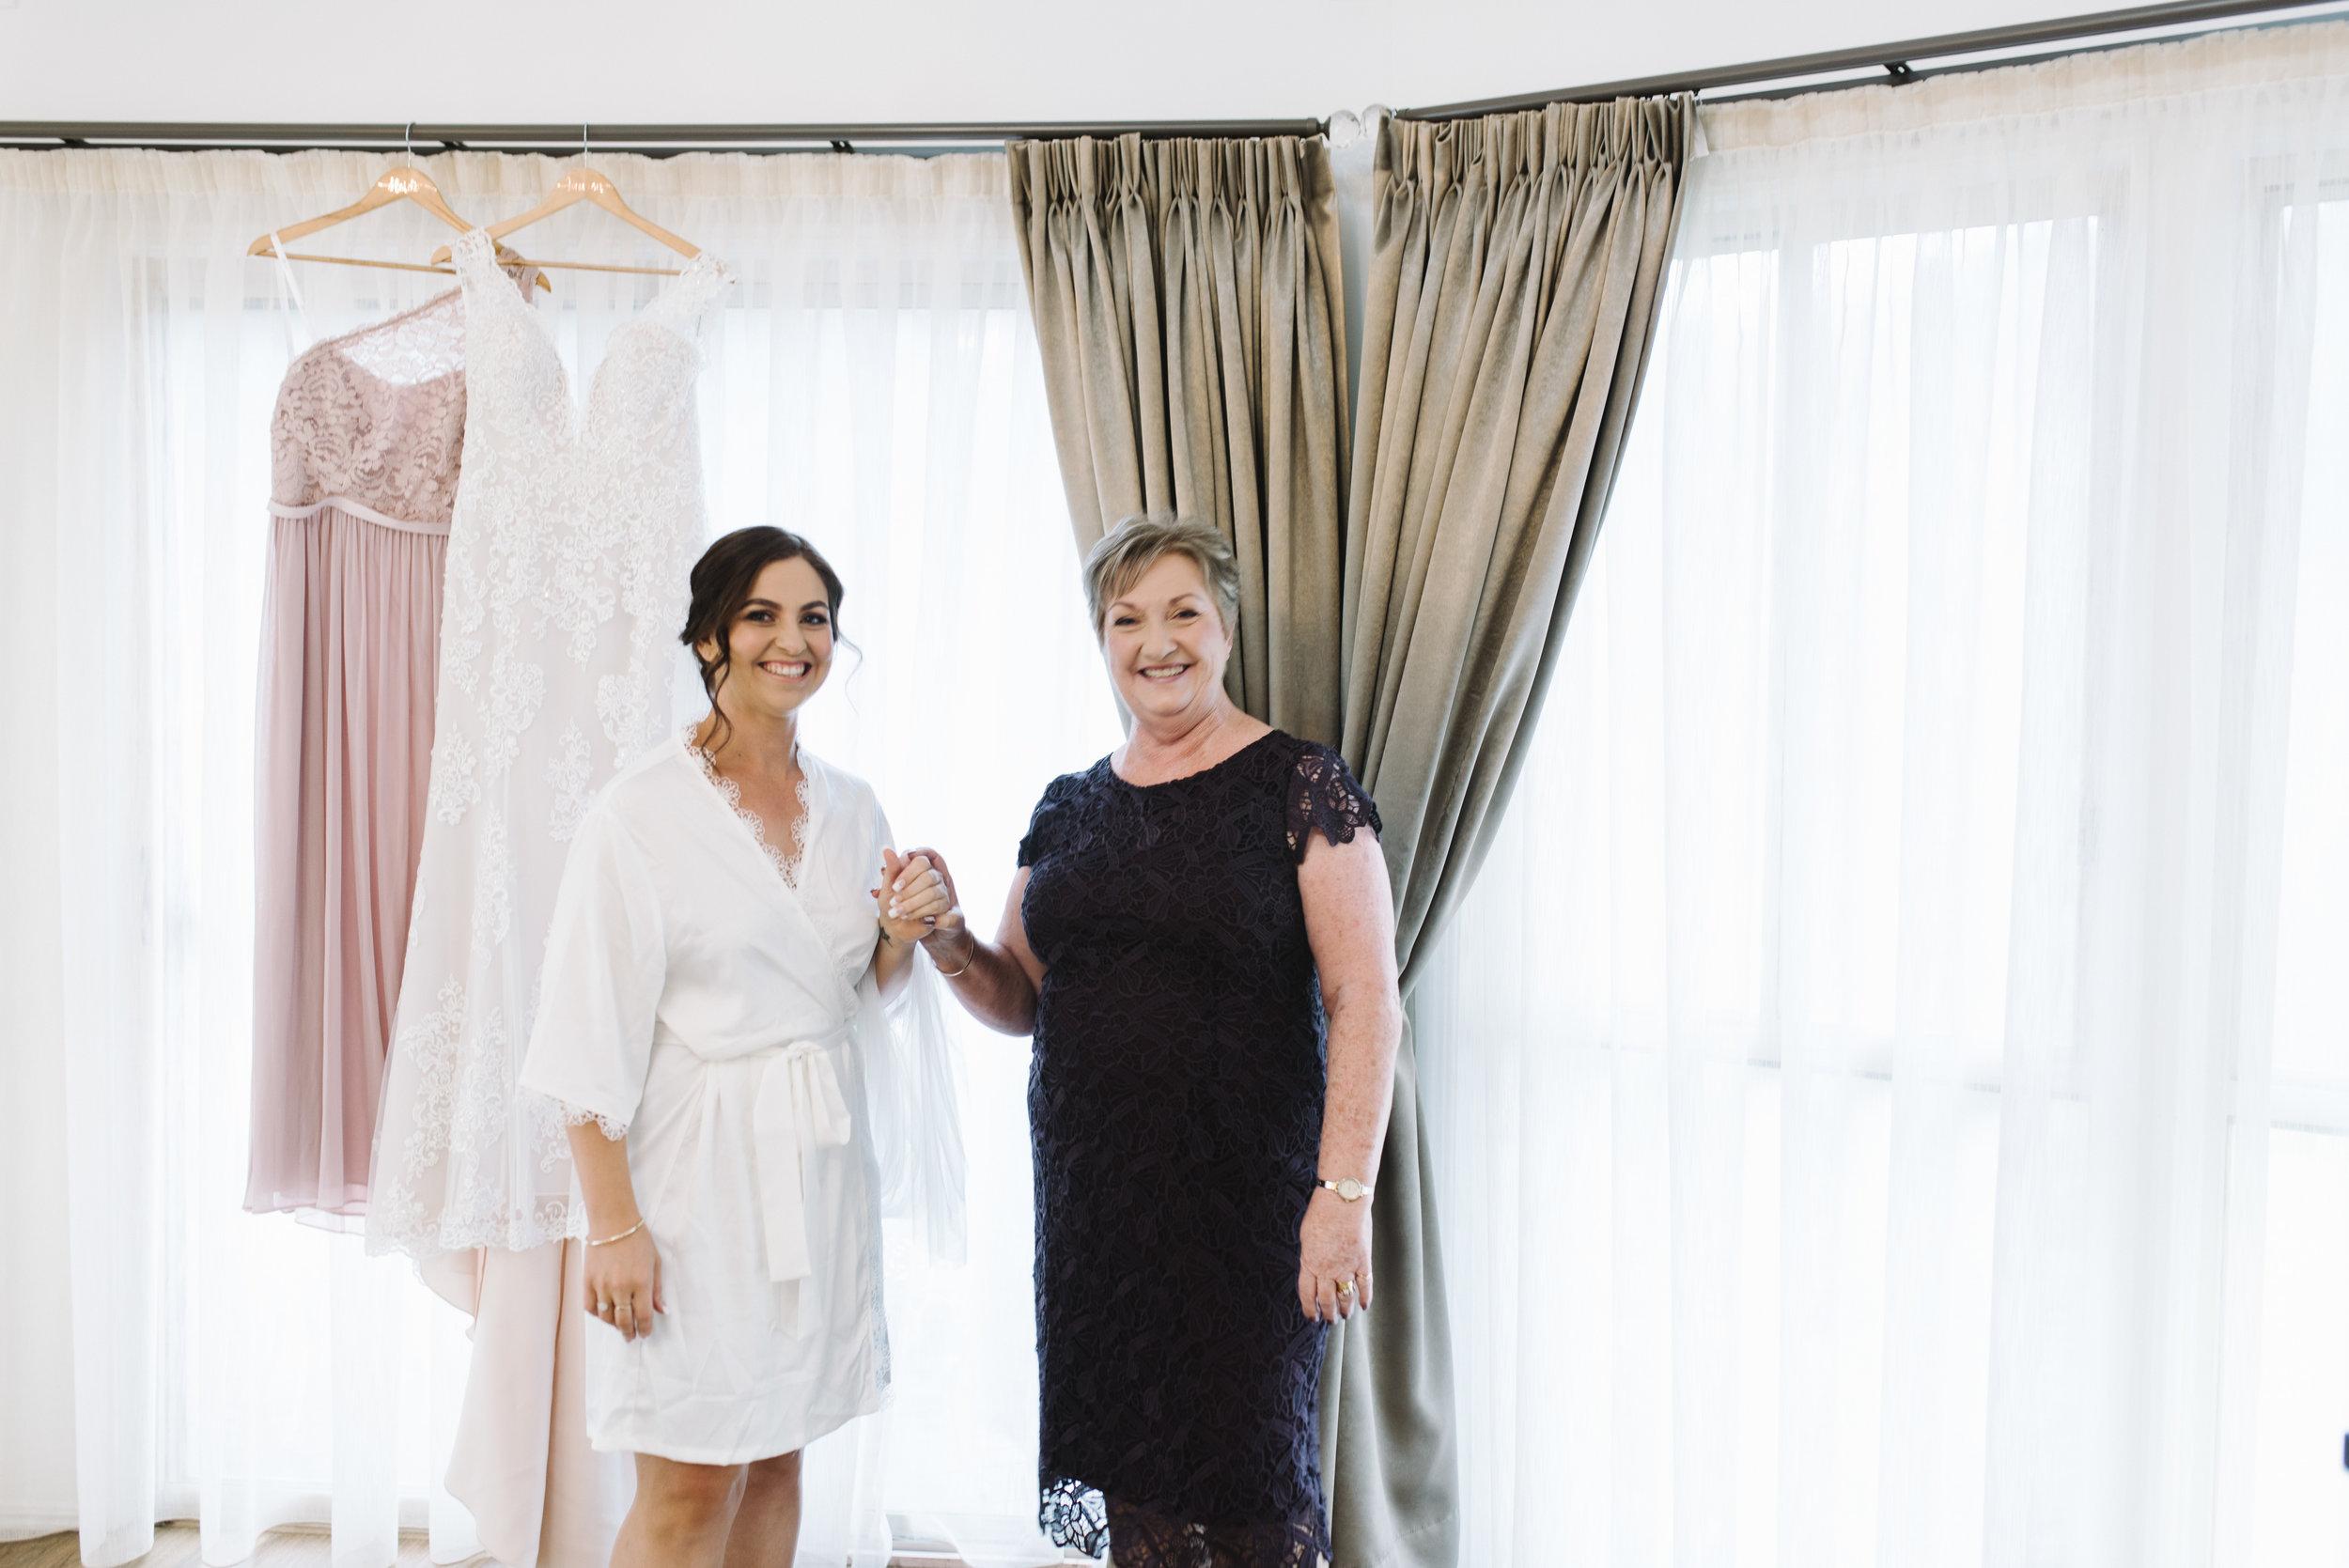 LAURENOLIVIA-austinvilla-estate-wedding-9.jpg